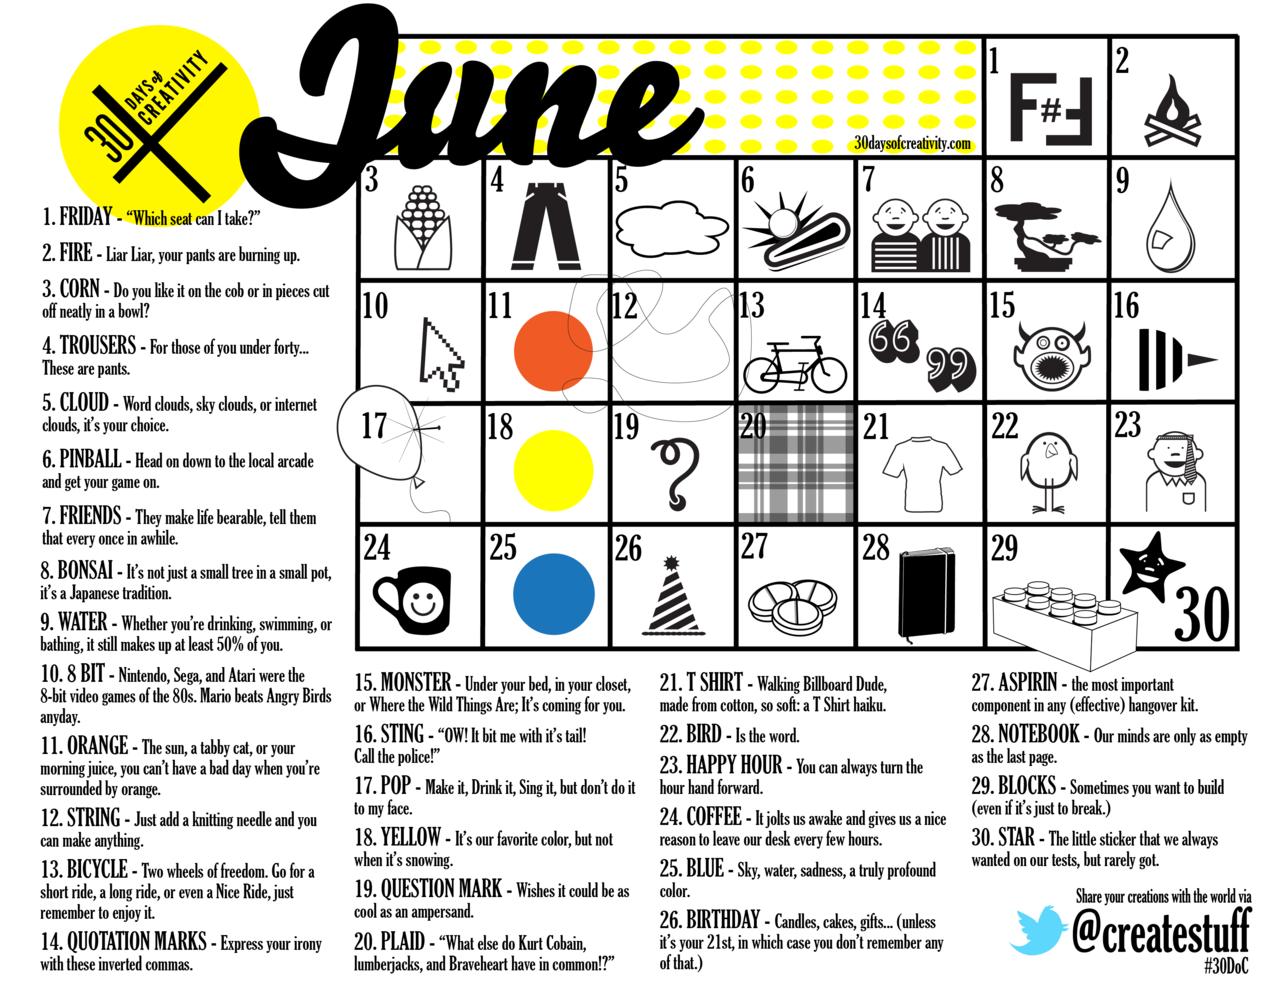 30 days of creativity calendar